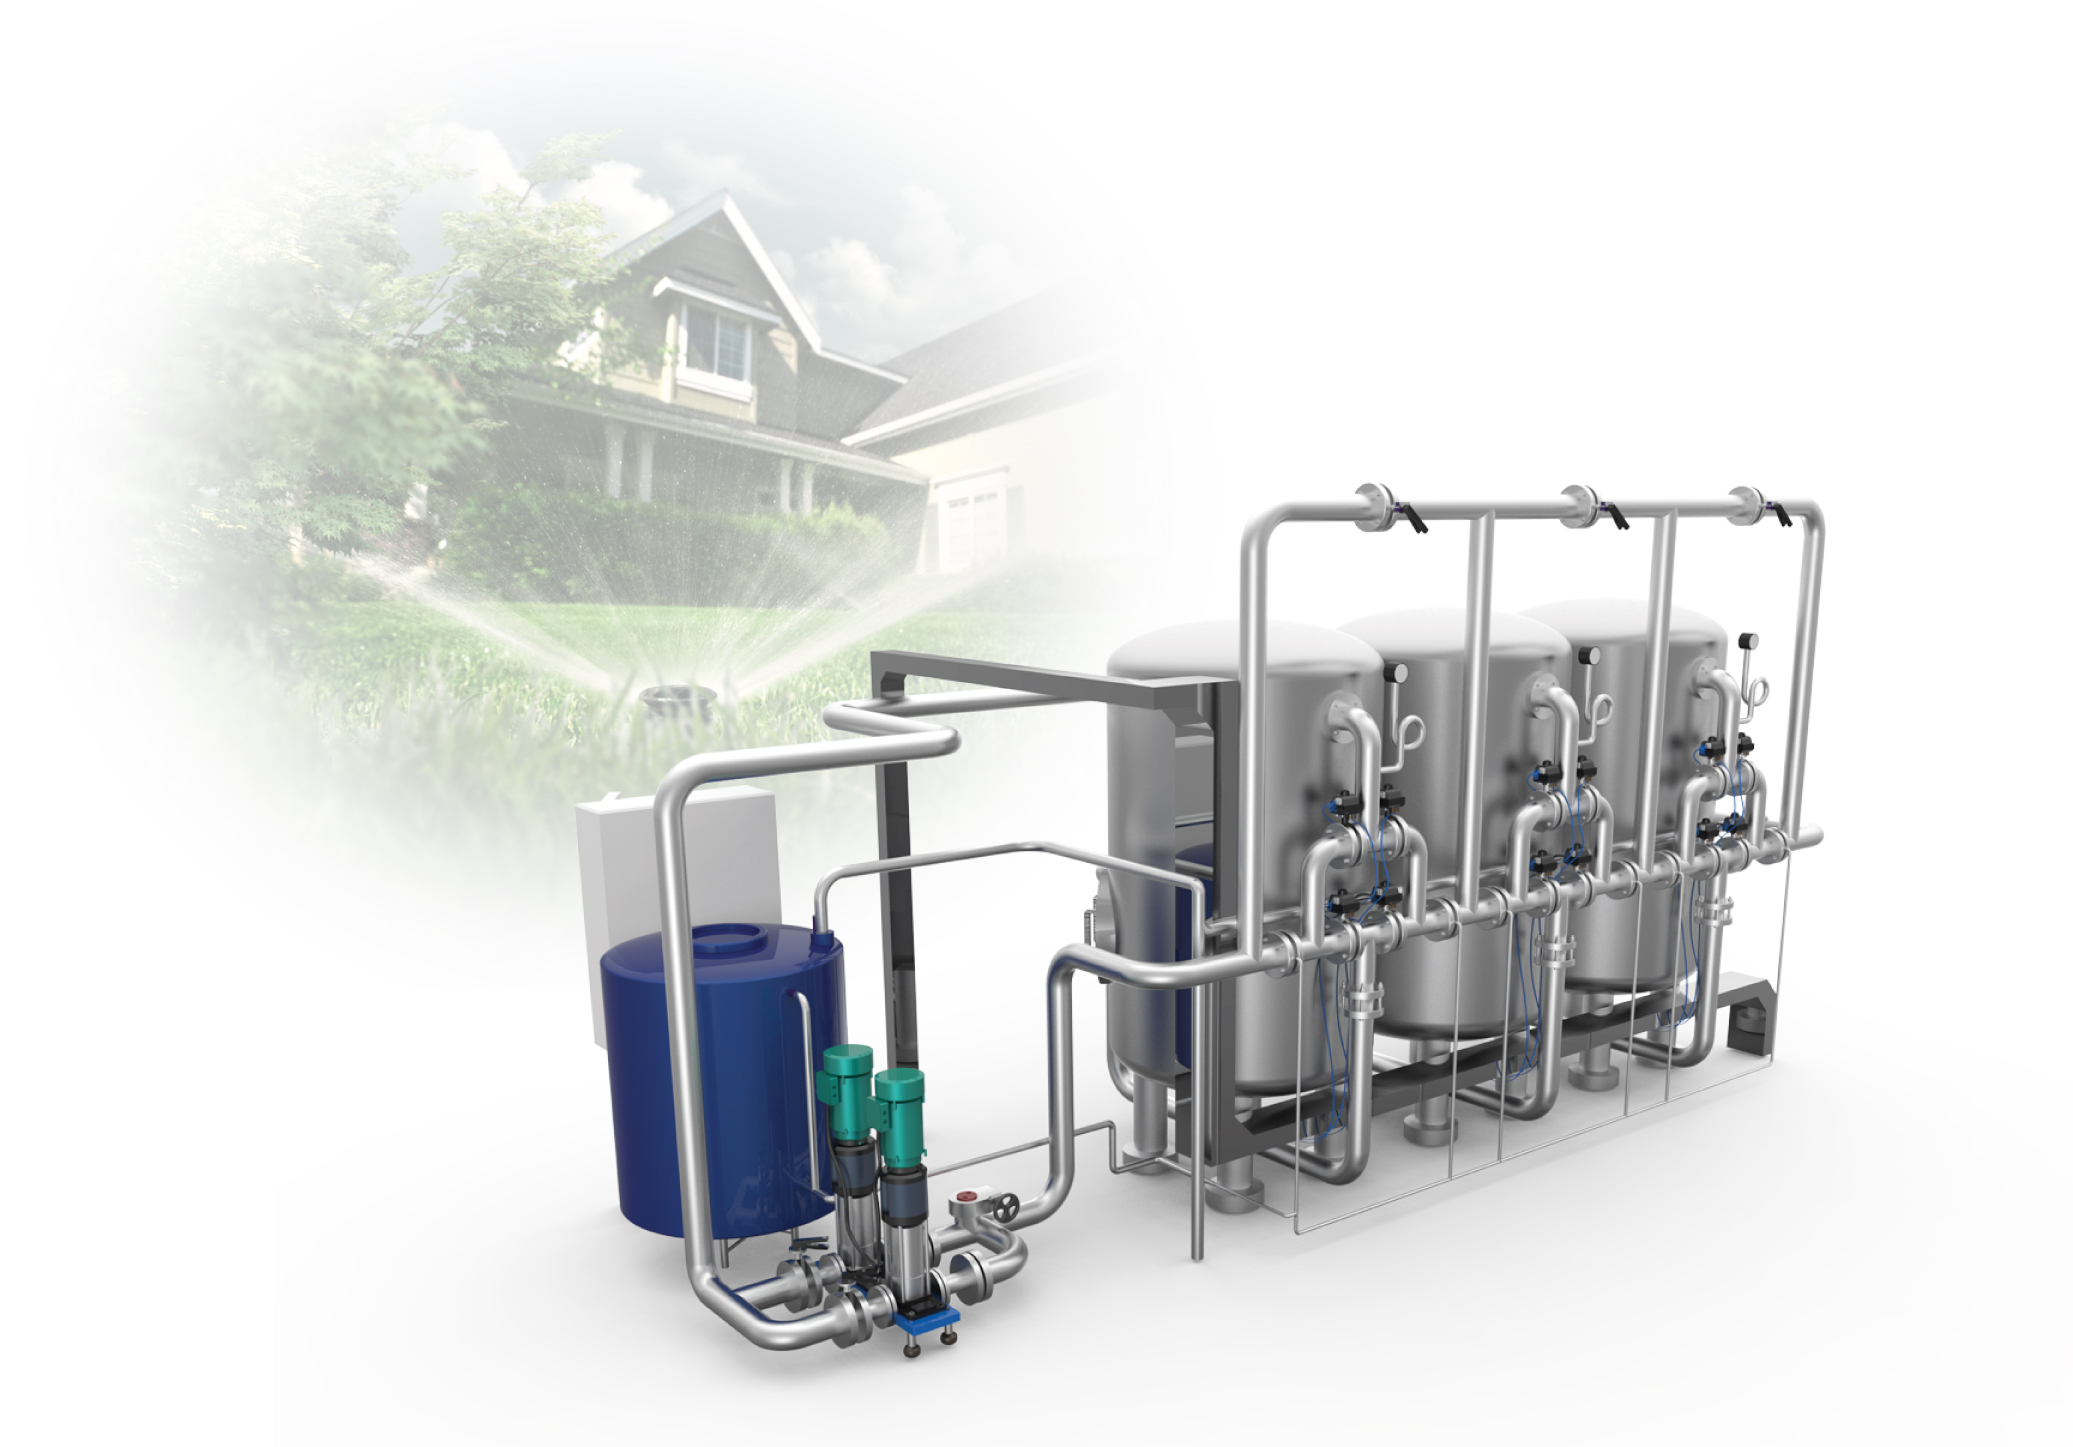 South Korea Reverse Osmosis System South Korea Reverse Osmosis